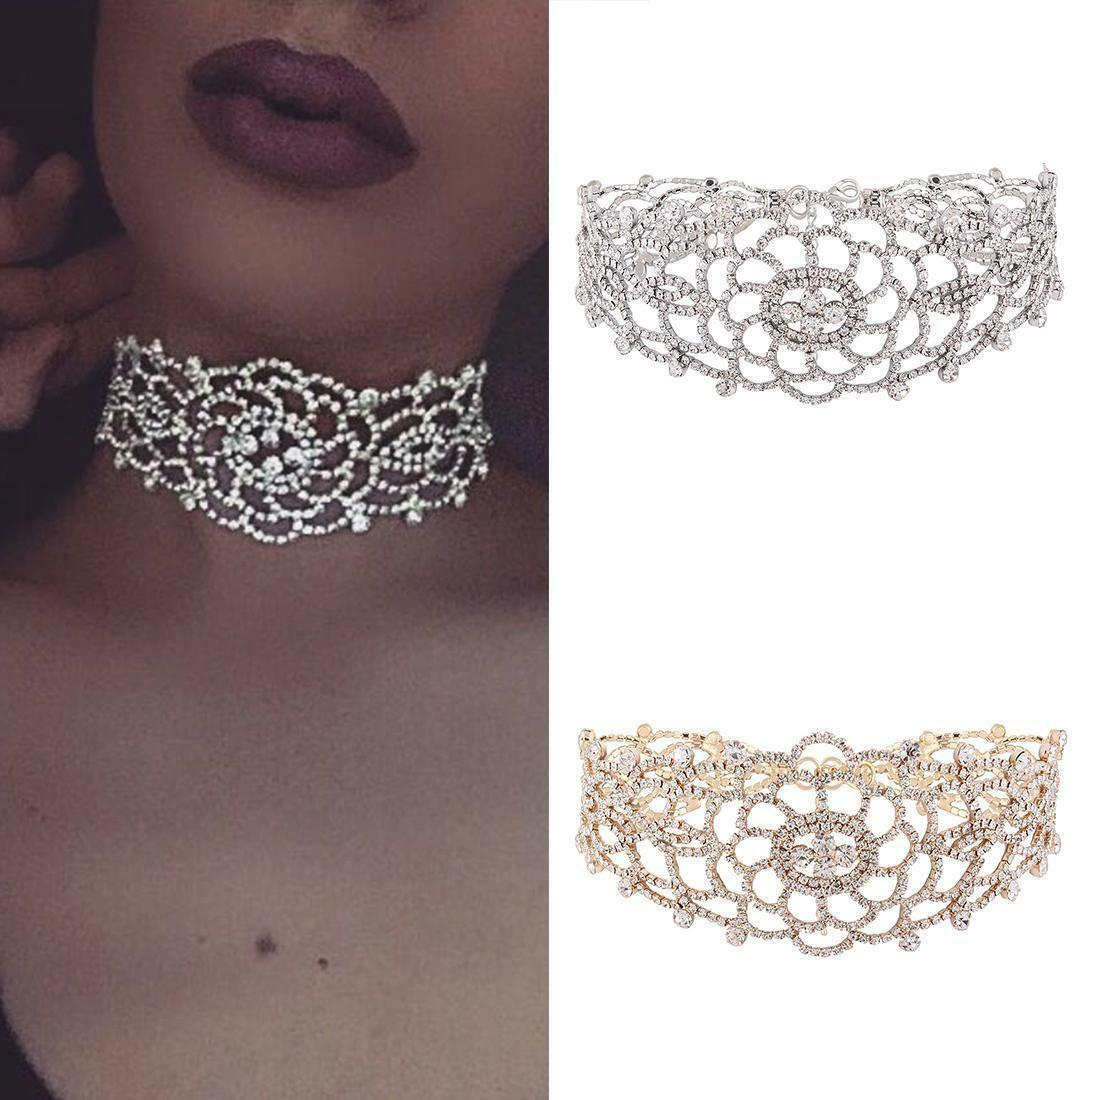 Jewellery - Women Fashion Pendant  Crystal Rhinestone Choker Wedding Jewelry Collar Necklace